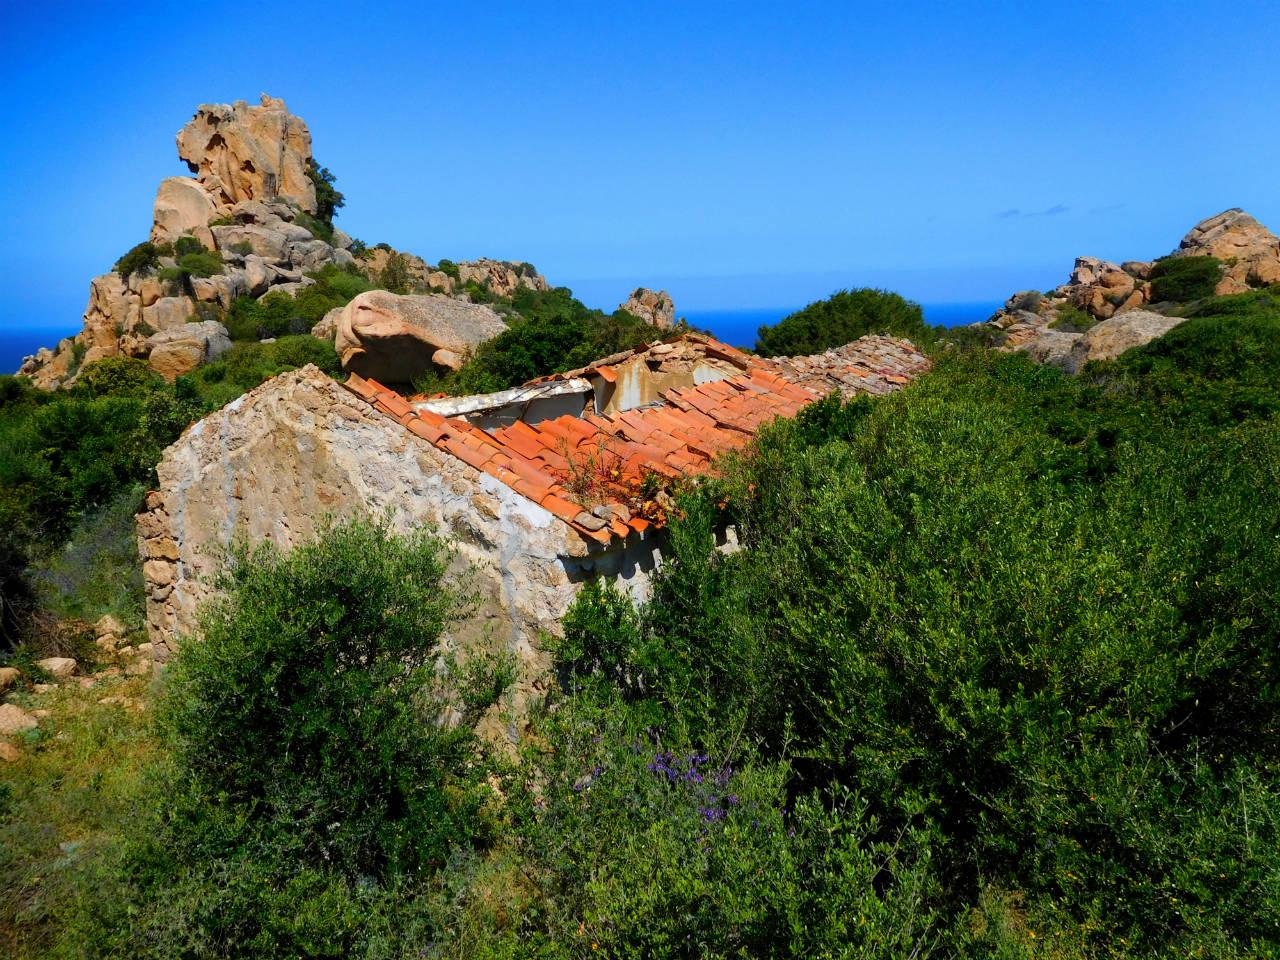 Sea view farmhouse for sale in Sardinia, a rare jewel in Trinità D'Agultu, 4ha land between granite and green bush.